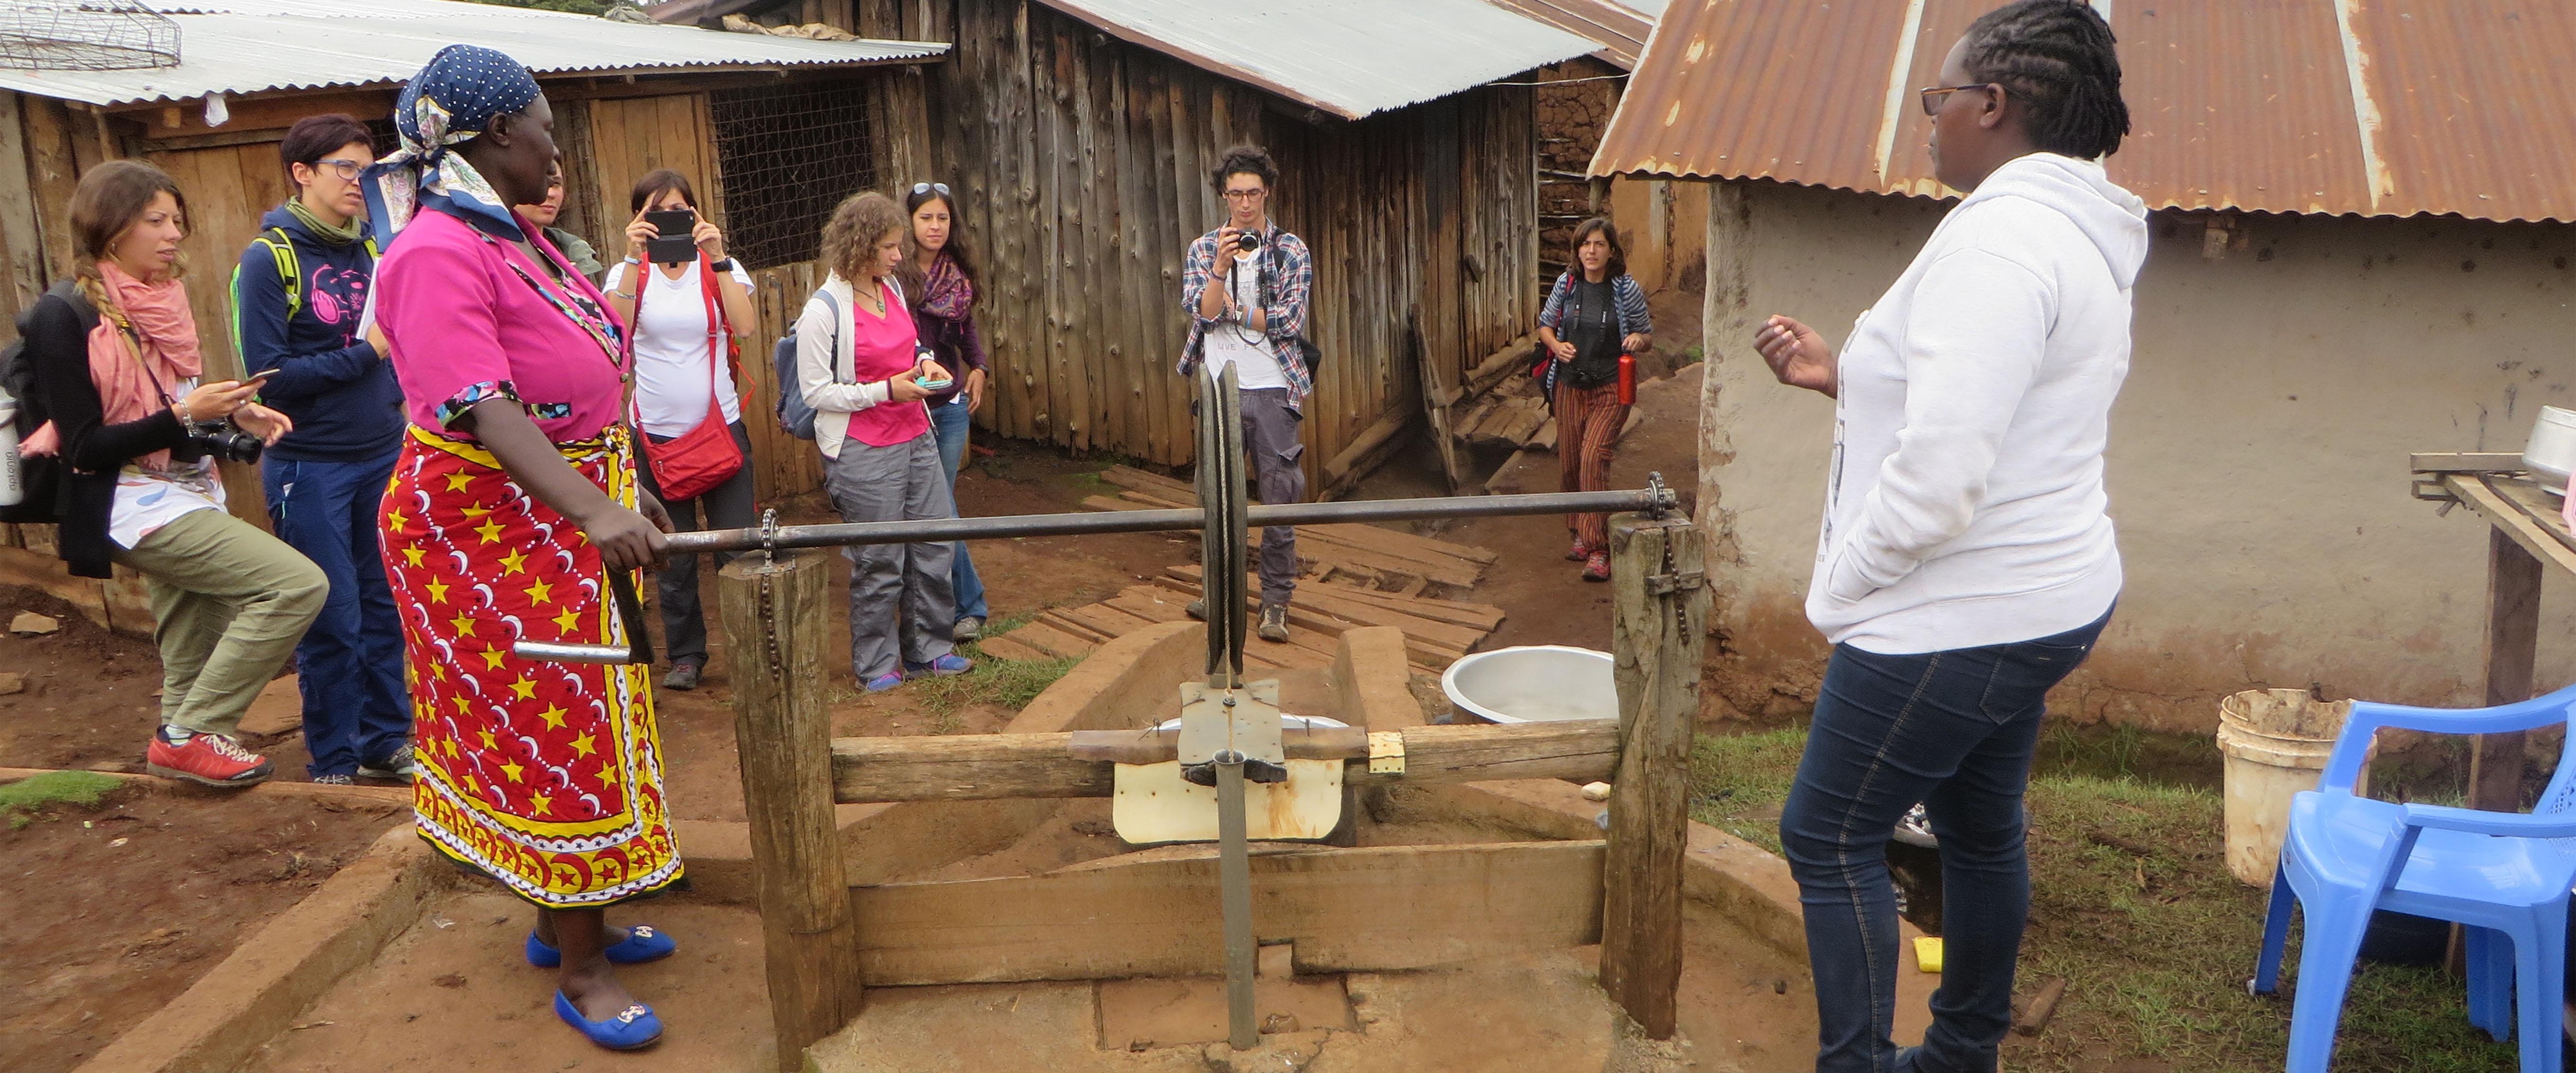 progetti donne villaggio Kenya Mani Tese 2017